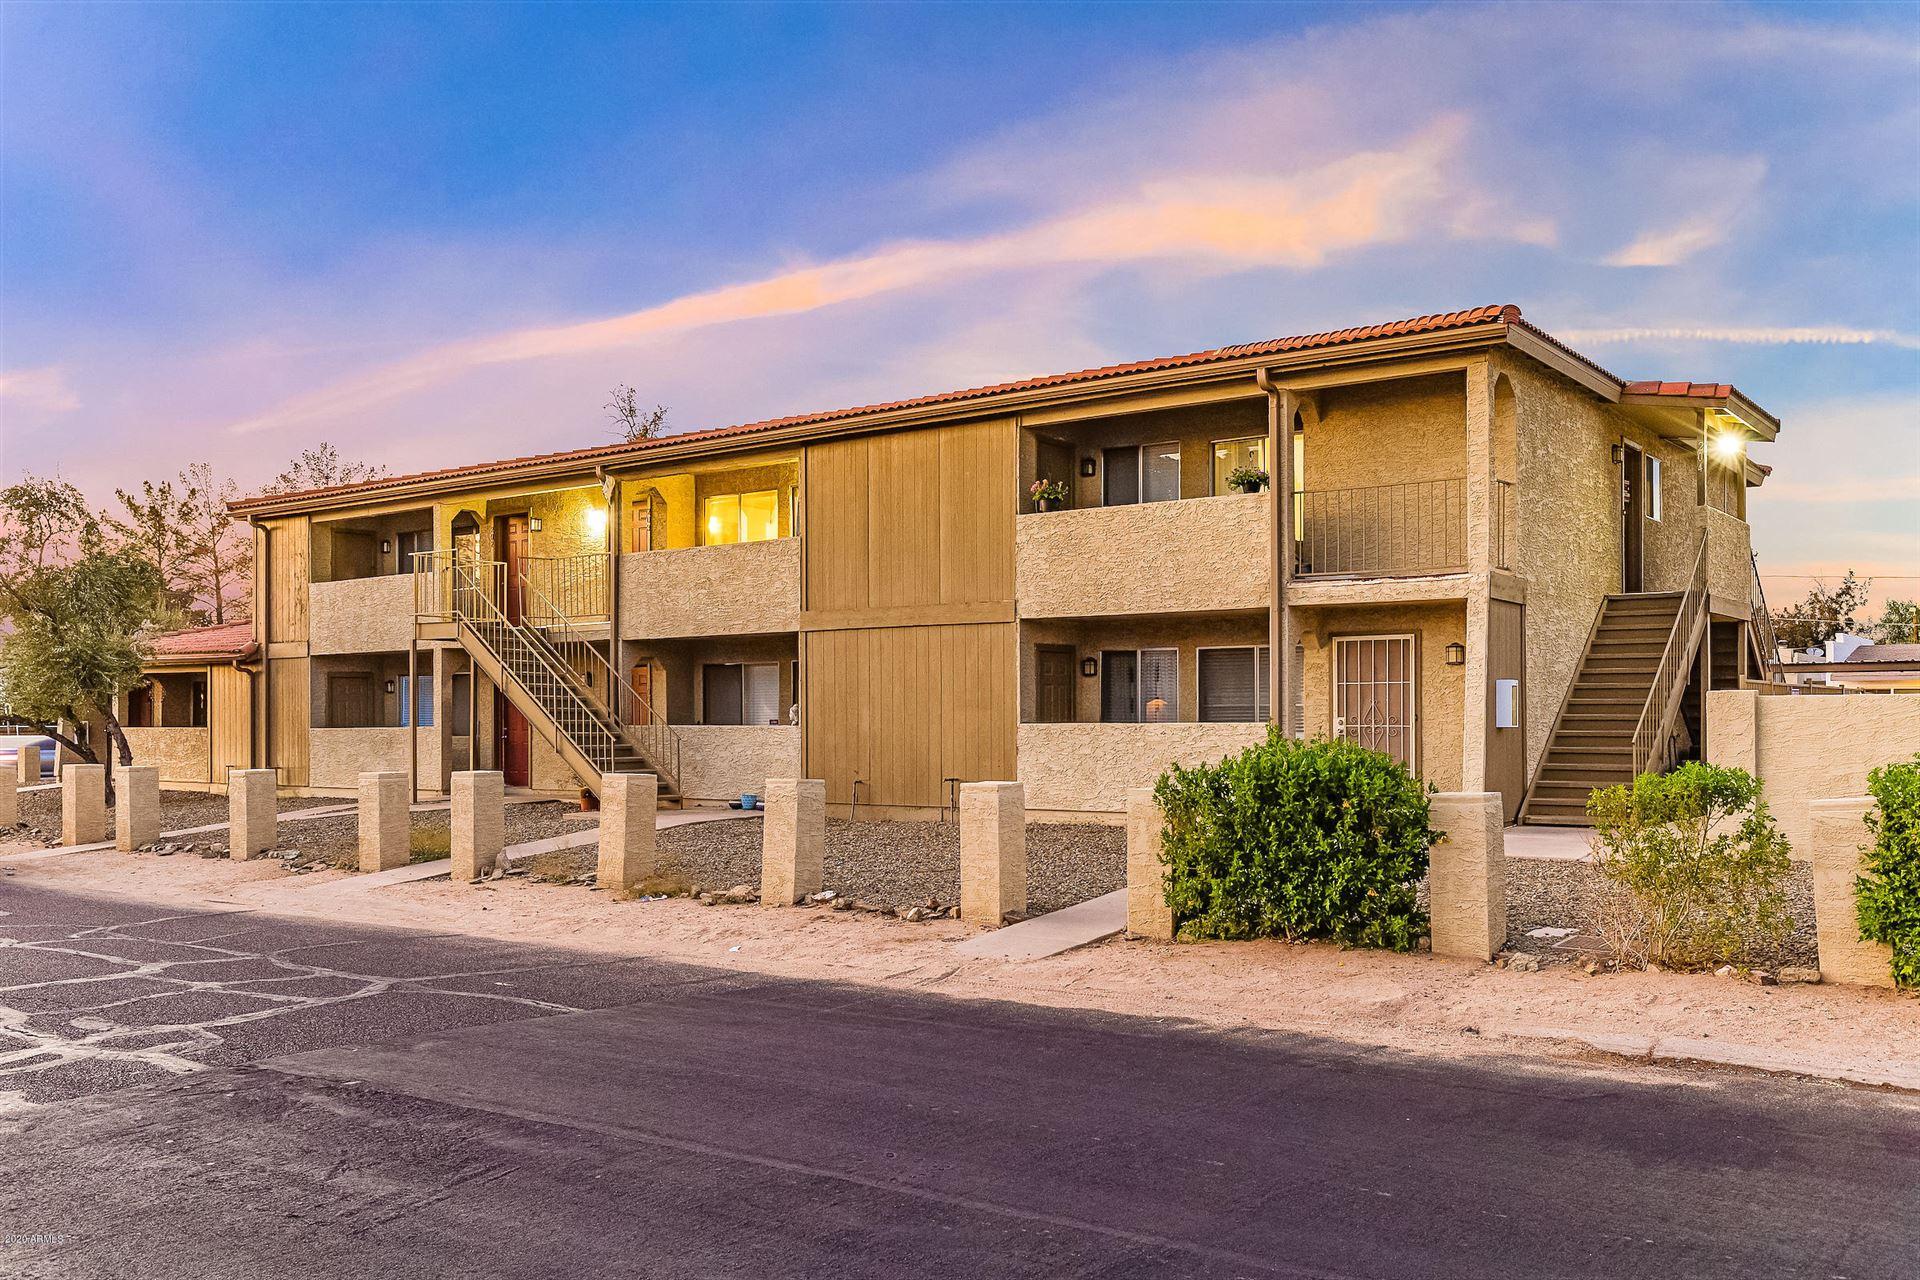 3818 E EARLL Drive, Phoenix, AZ 85018 - MLS#: 6167898